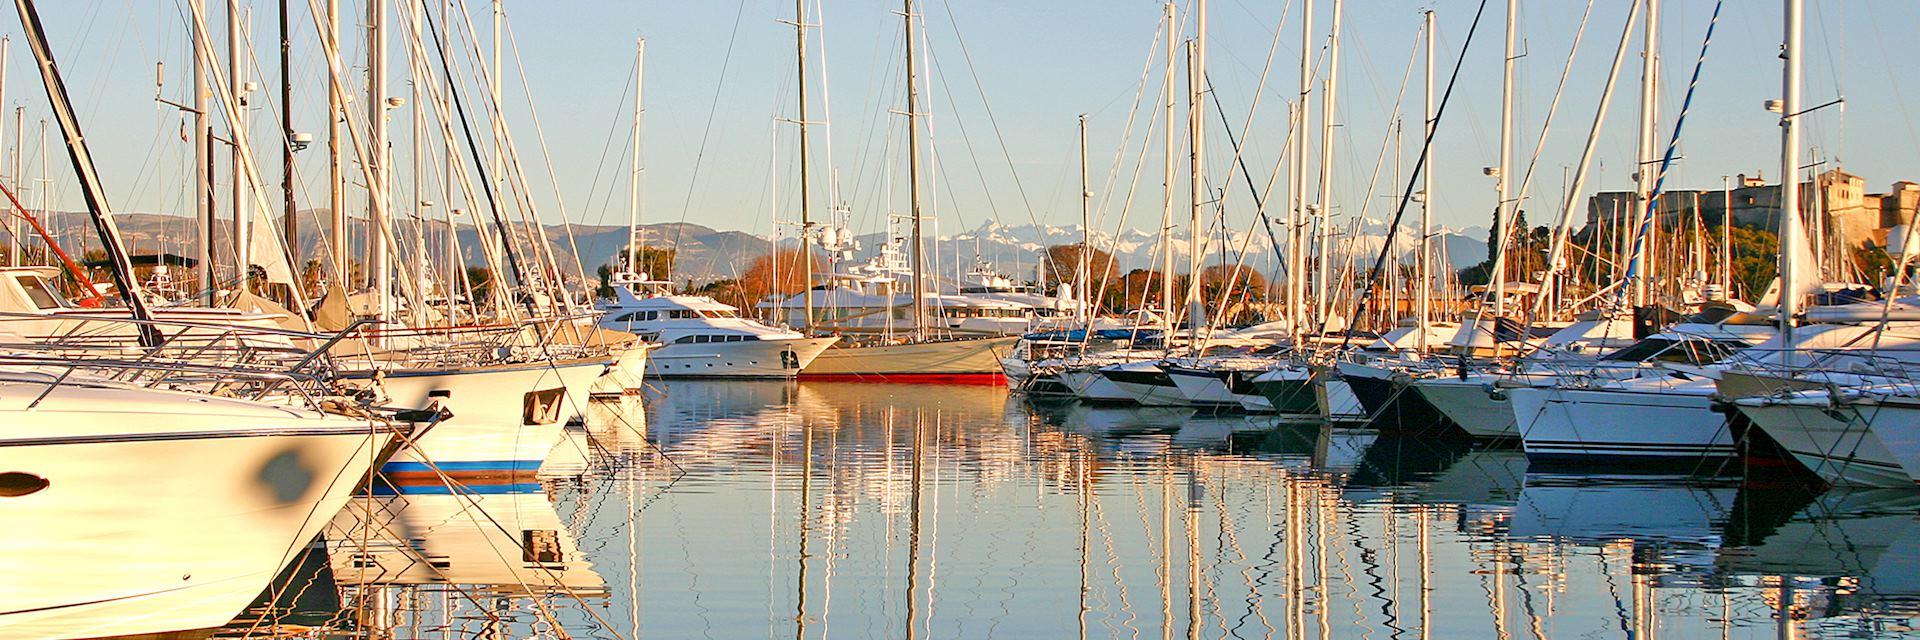 Port of Antibes